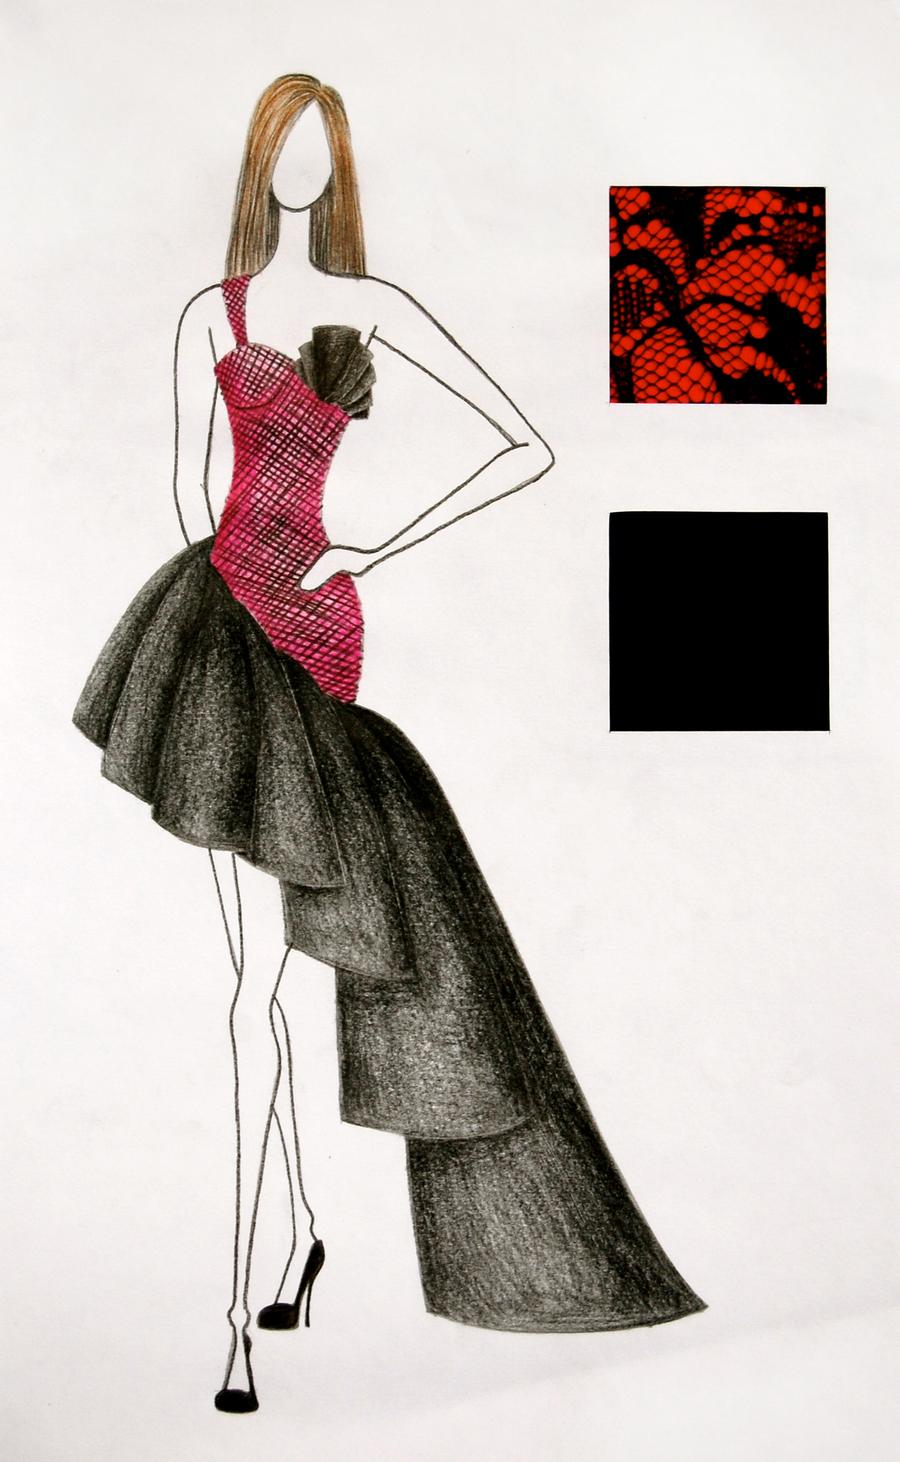 fashion sketch 11 by guptillc on deviantart